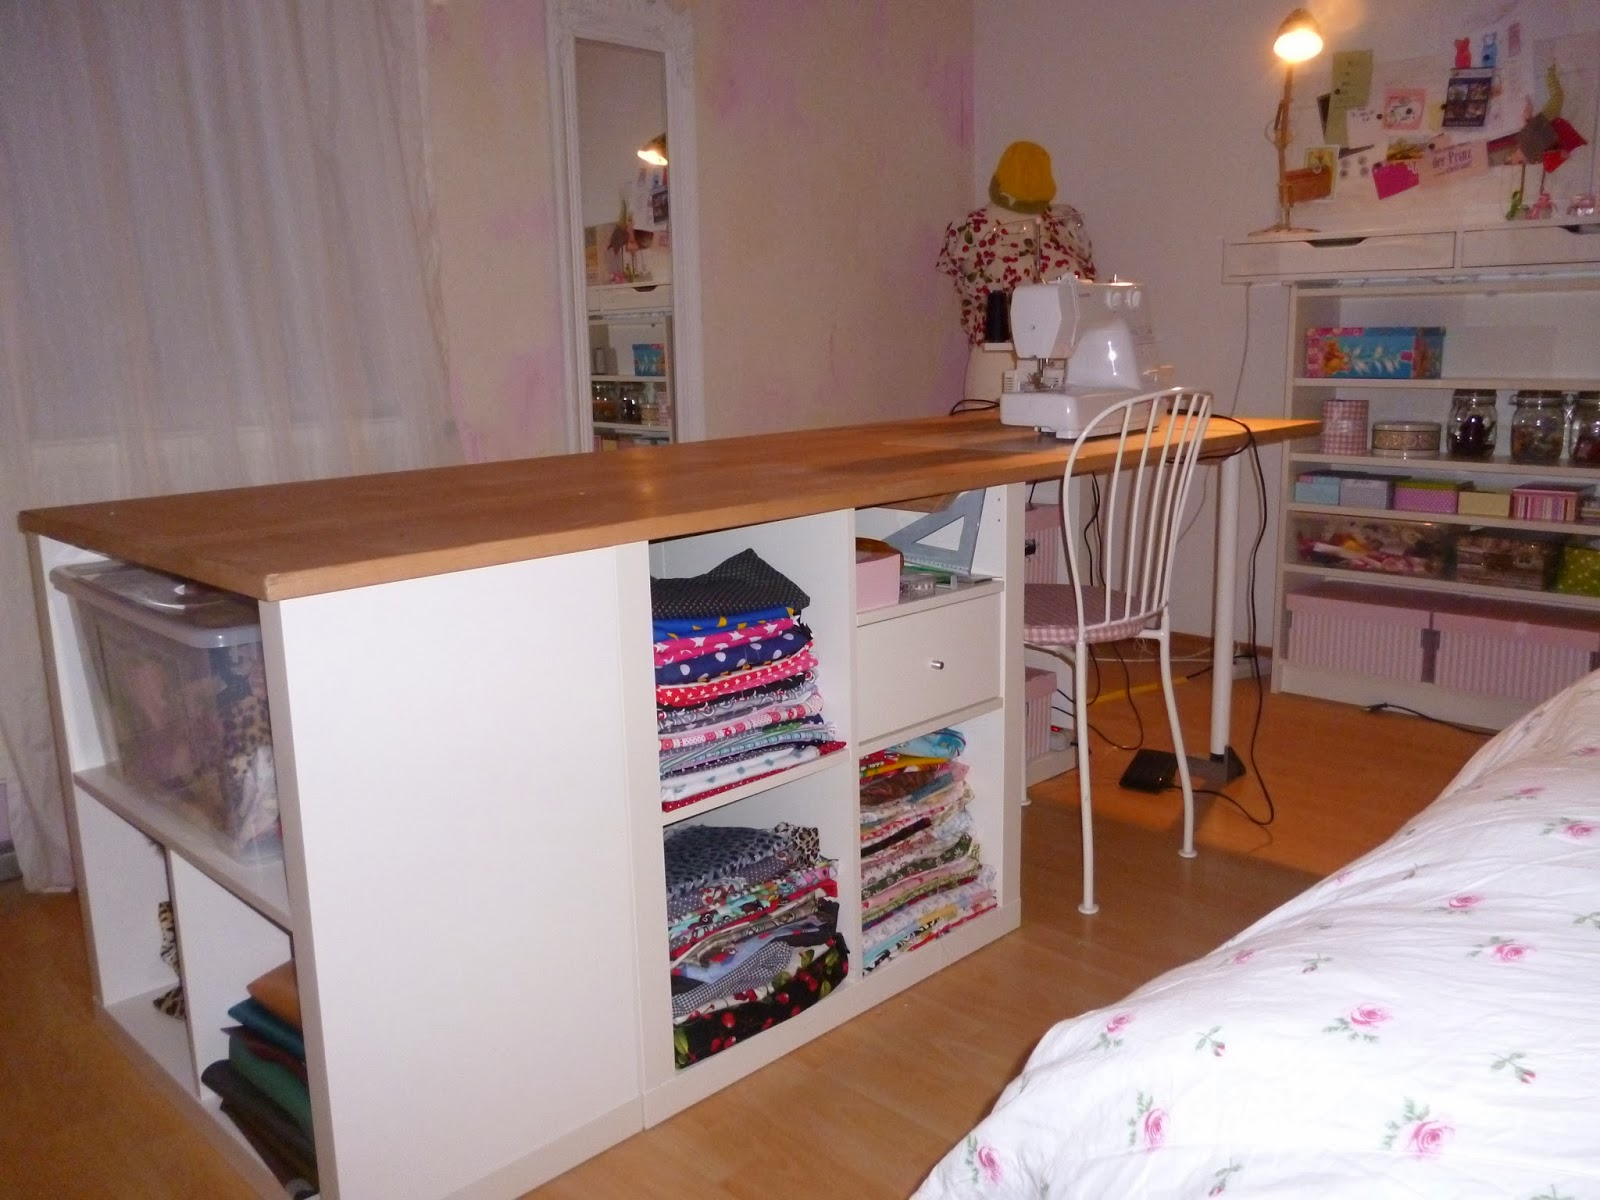 leolilie meine nigelnagelneue machtzentrale. Black Bedroom Furniture Sets. Home Design Ideas